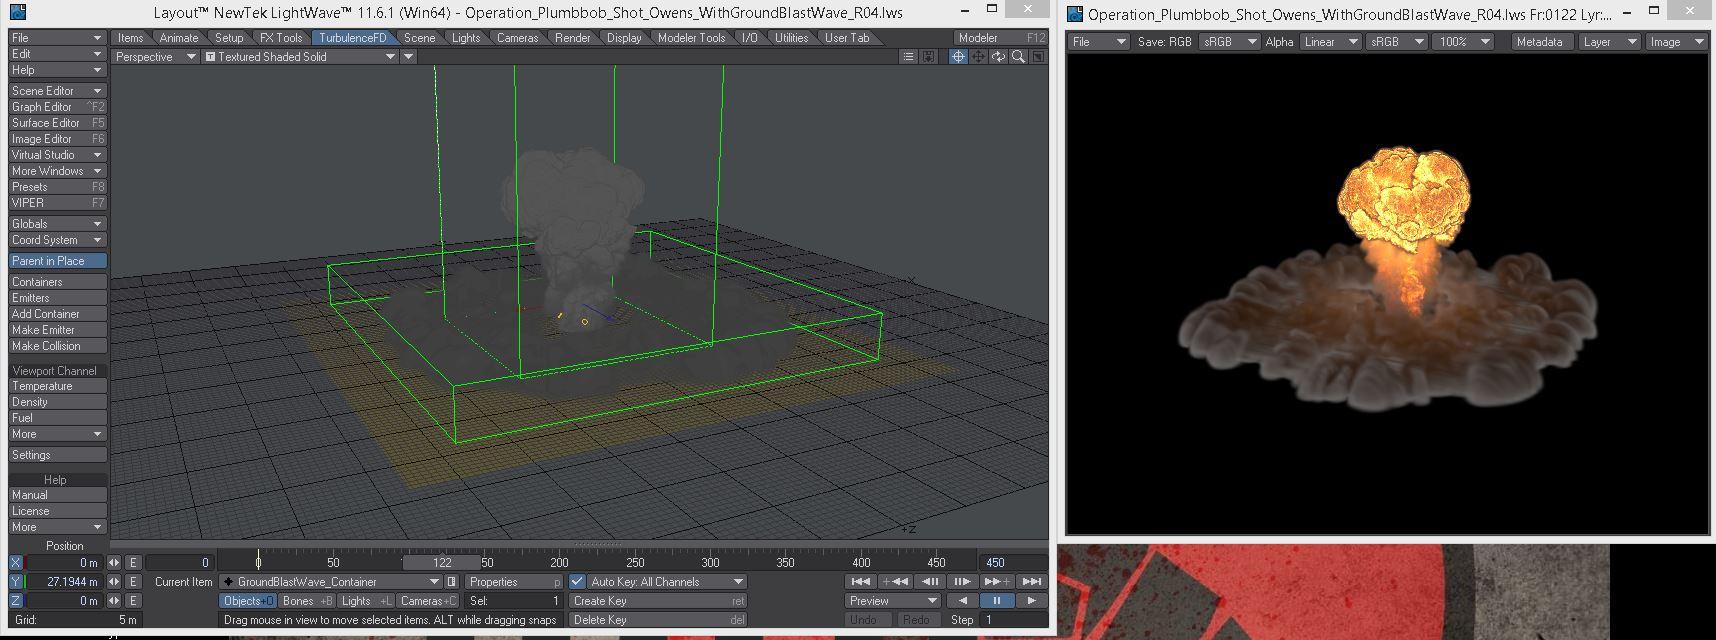 tfd for lightwave3d advanced concepts and projects nuclear weapons rh liberty3d com LightWave 3D Models Lightwave 3D Software